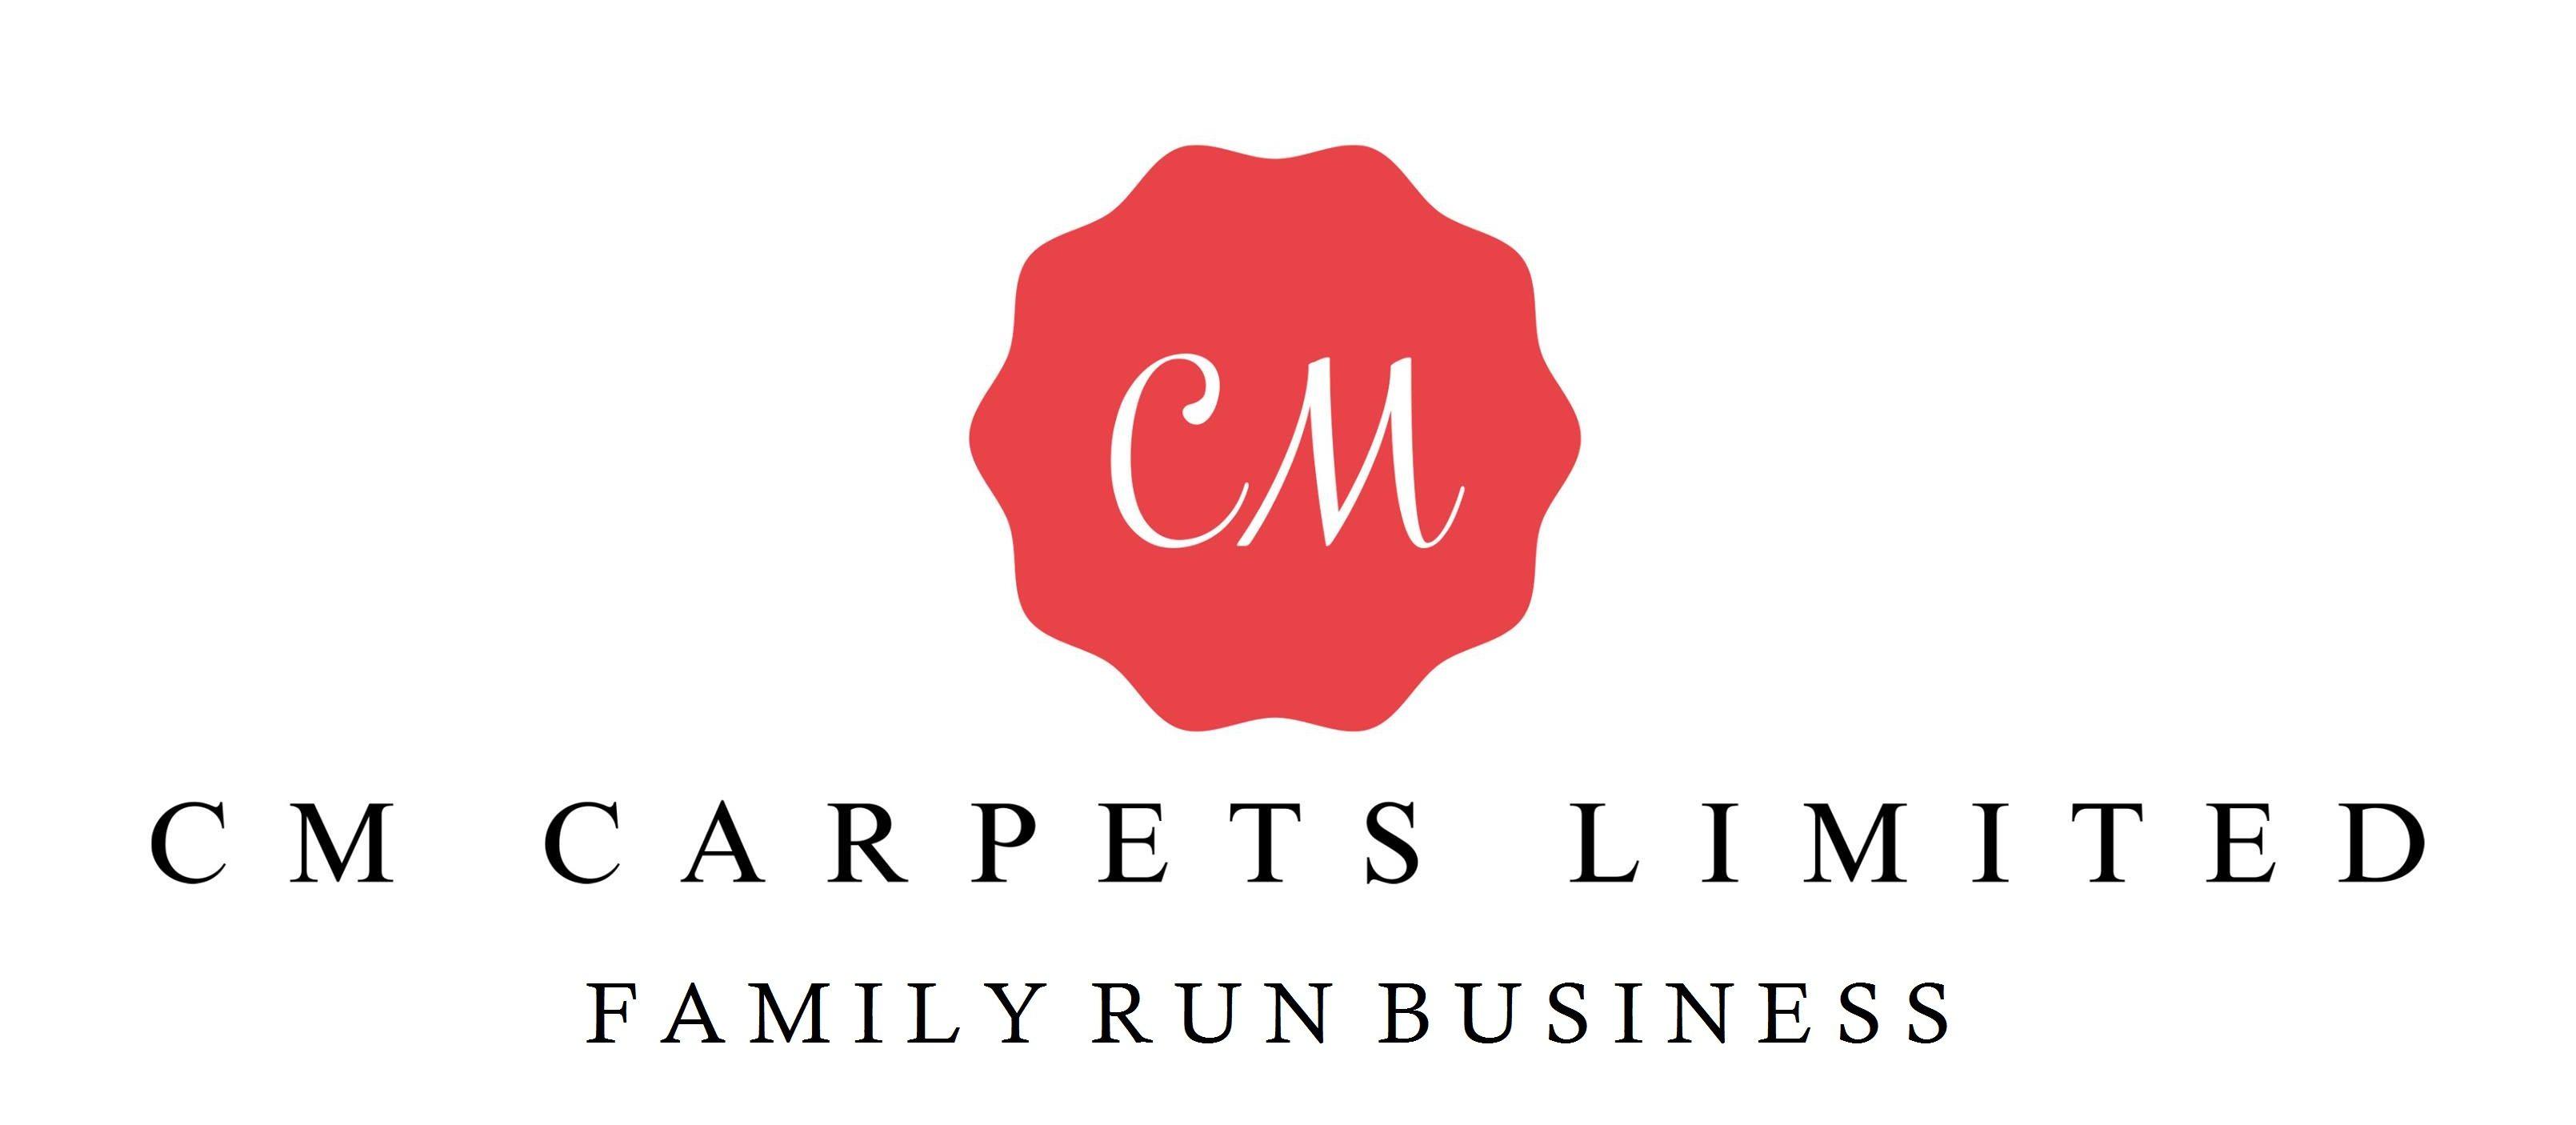 CM Carpets Limited